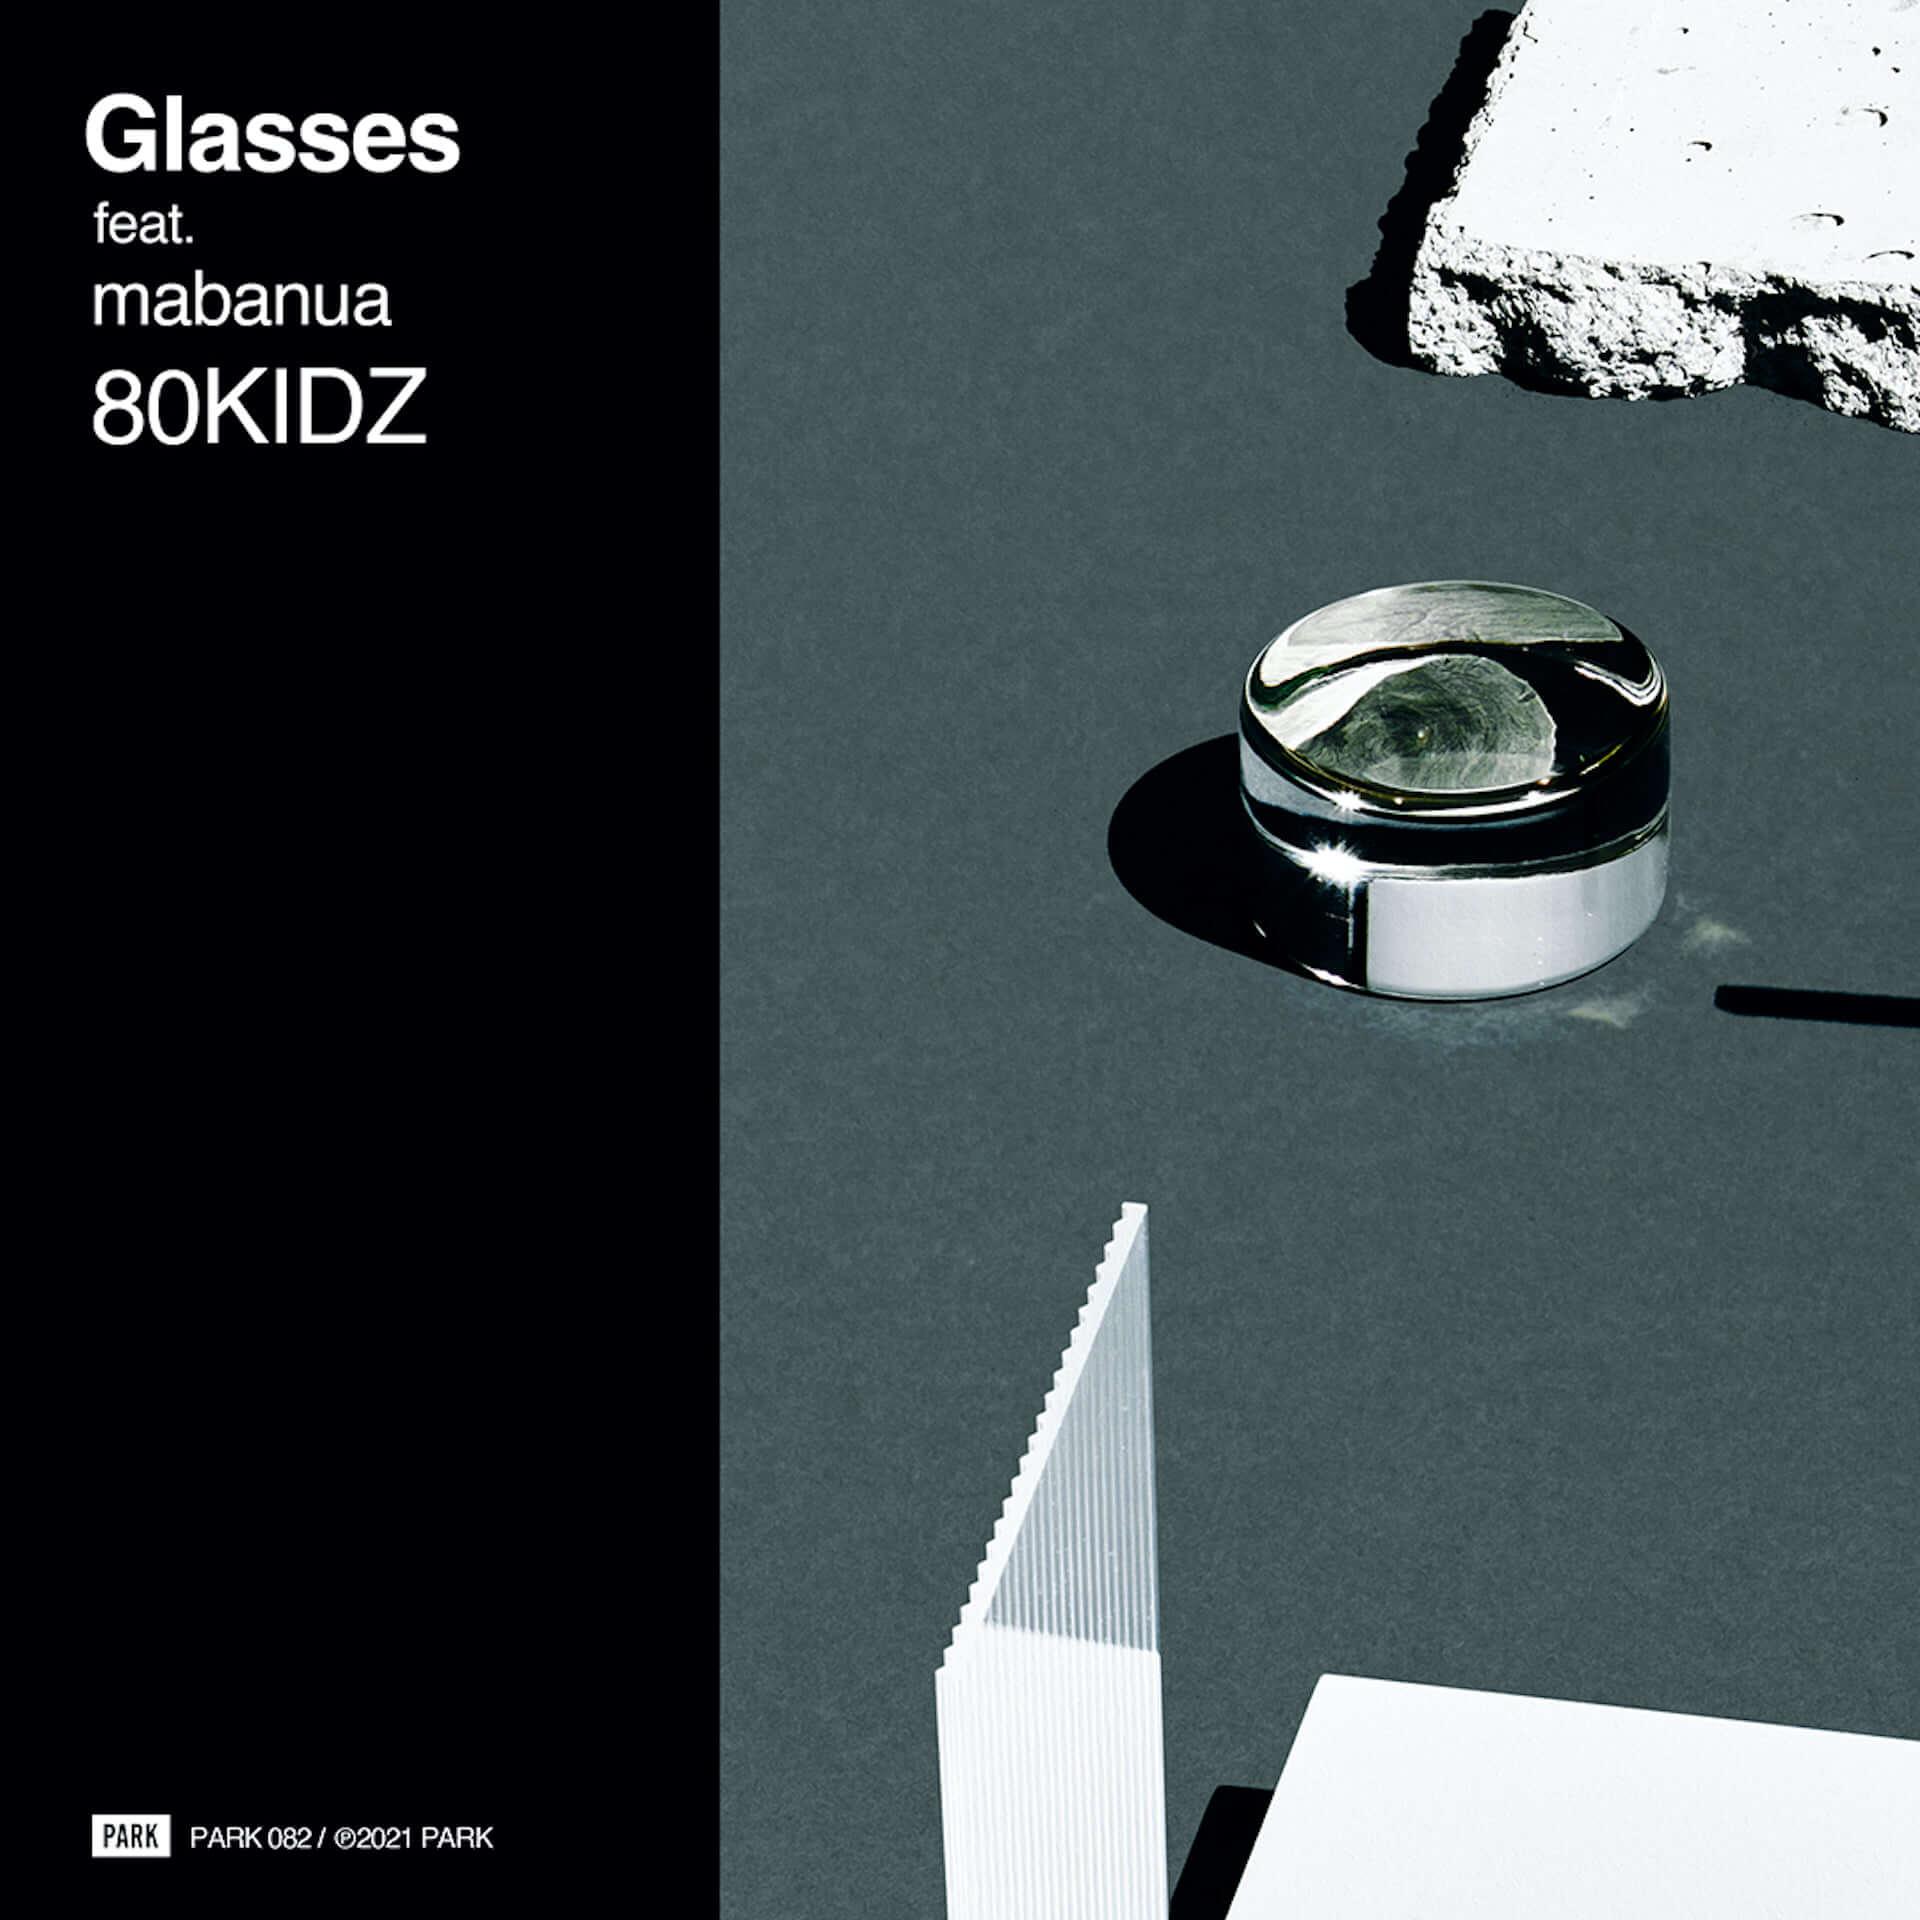 "80KIDZがmabanuaを迎えた新曲""Glasses feat. mabanua""をリリース!作詞担当はHiro-a-key music210113_80kidz_1-1920x1920"